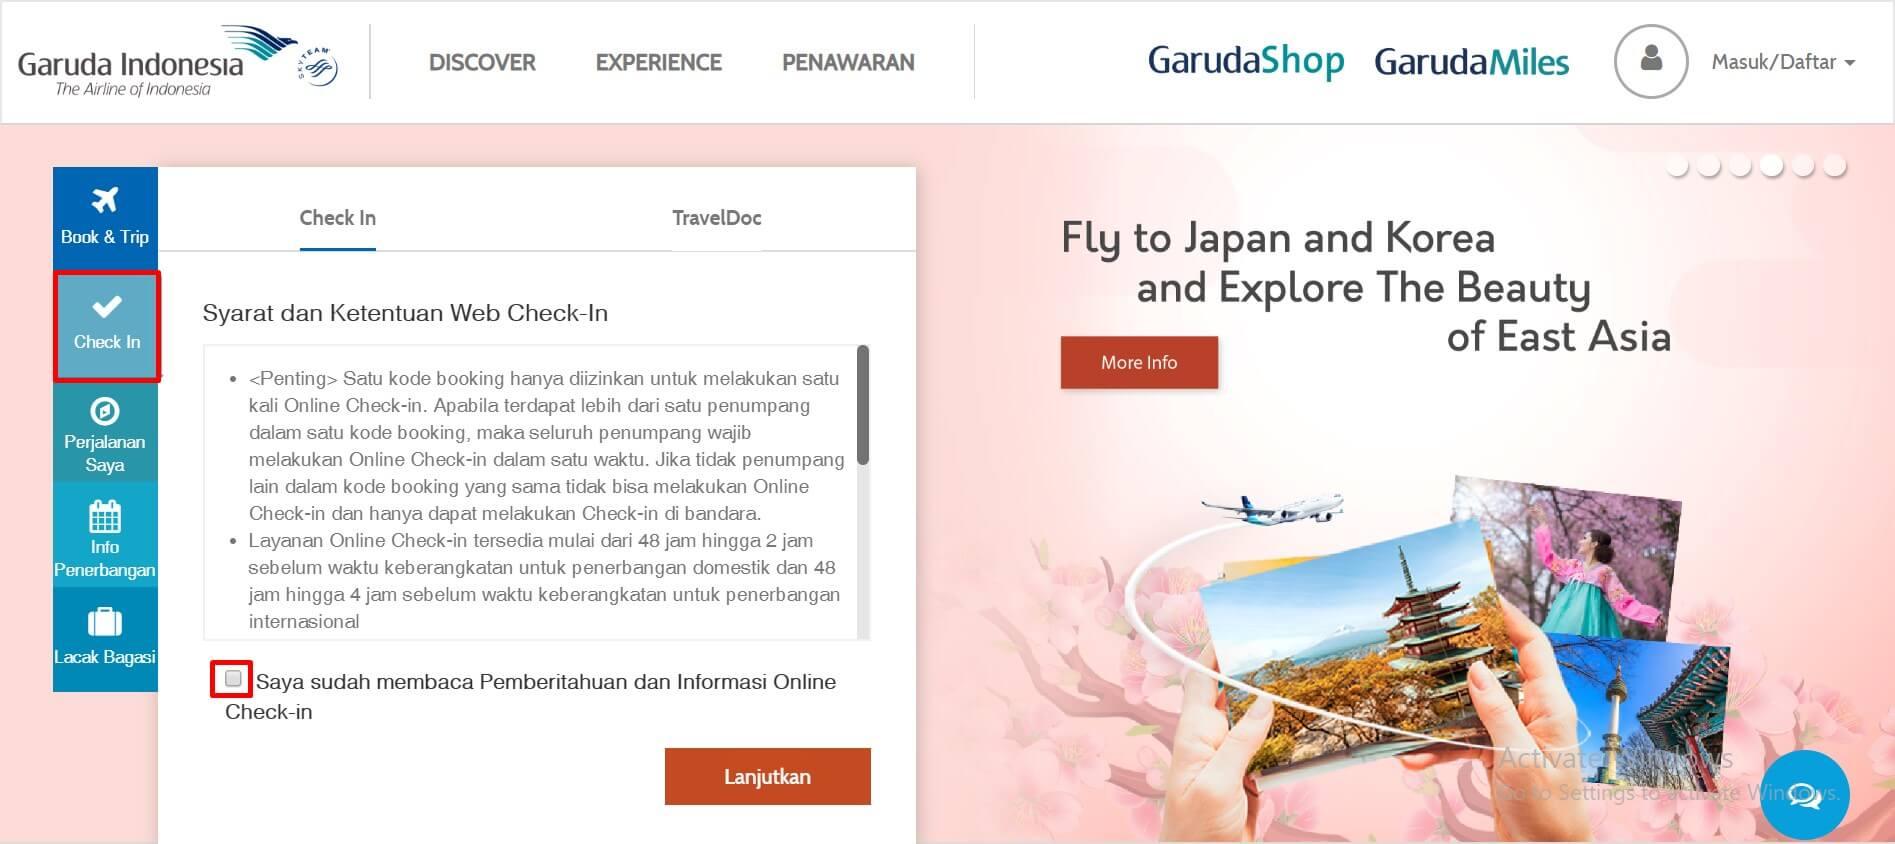 Buka Situs Website Garuda Indonesia